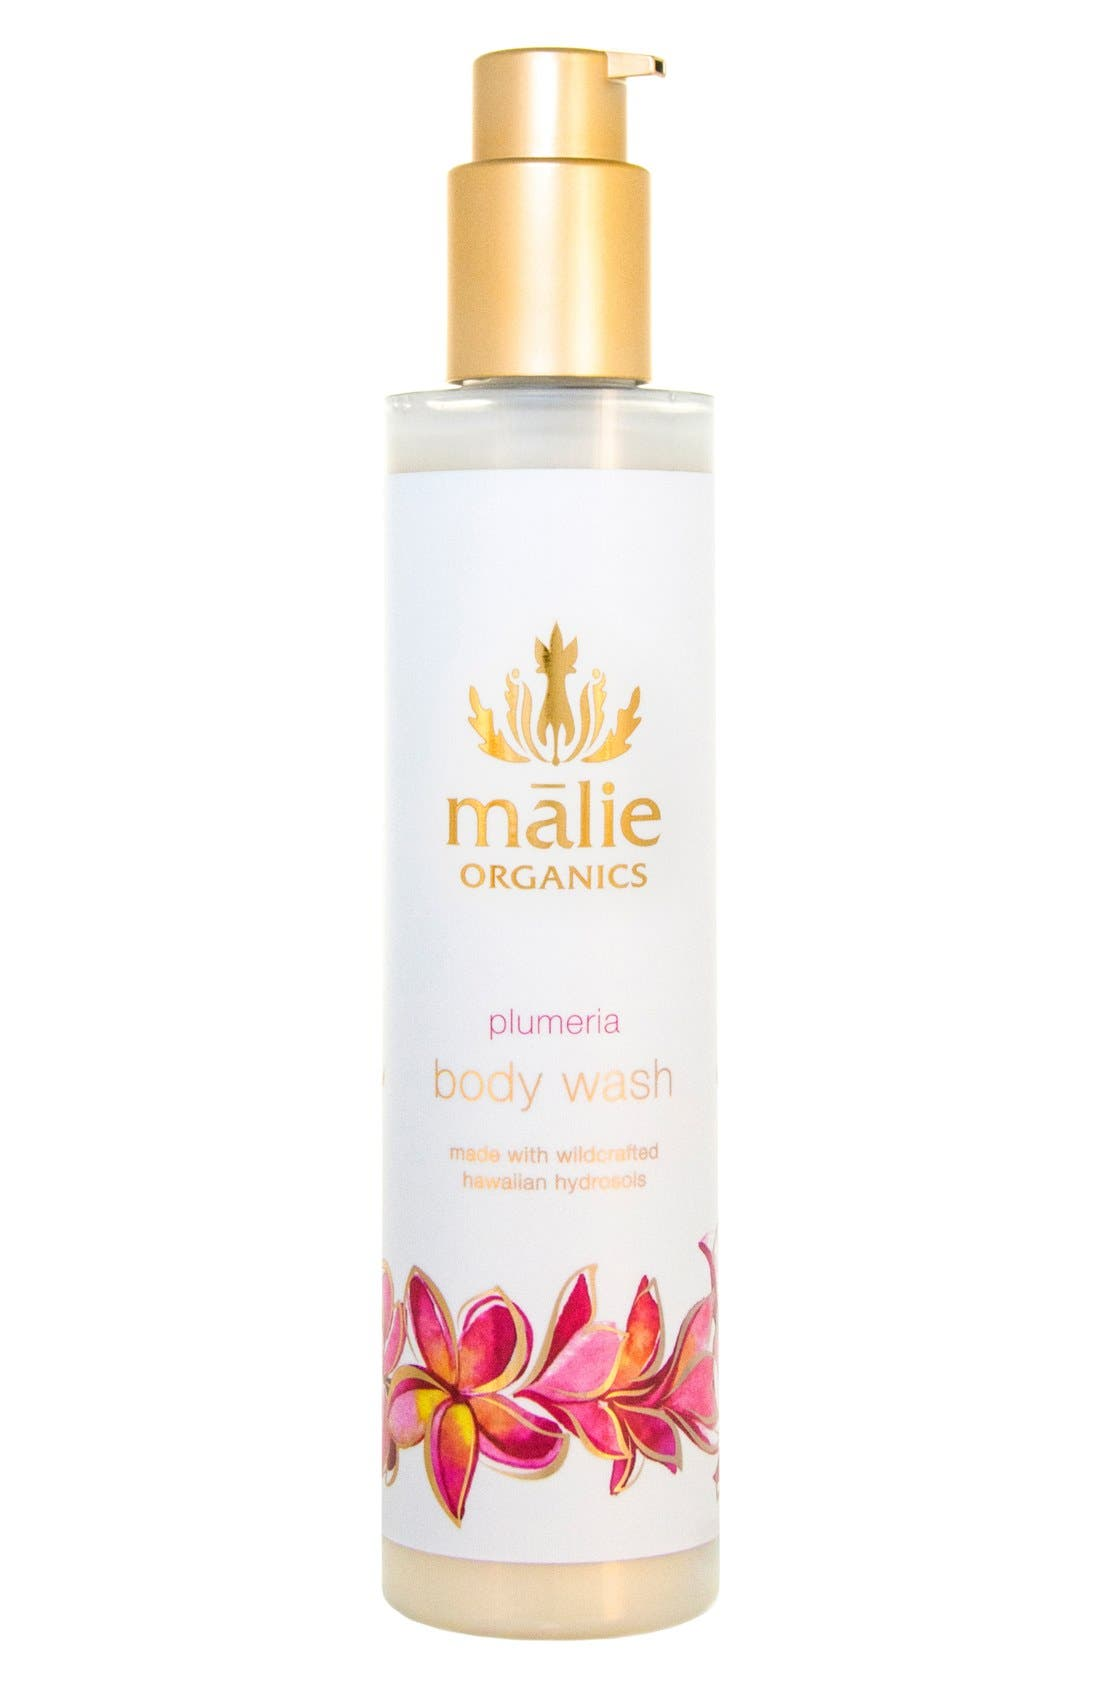 Malie Organics Plumeria Organic Body Wash